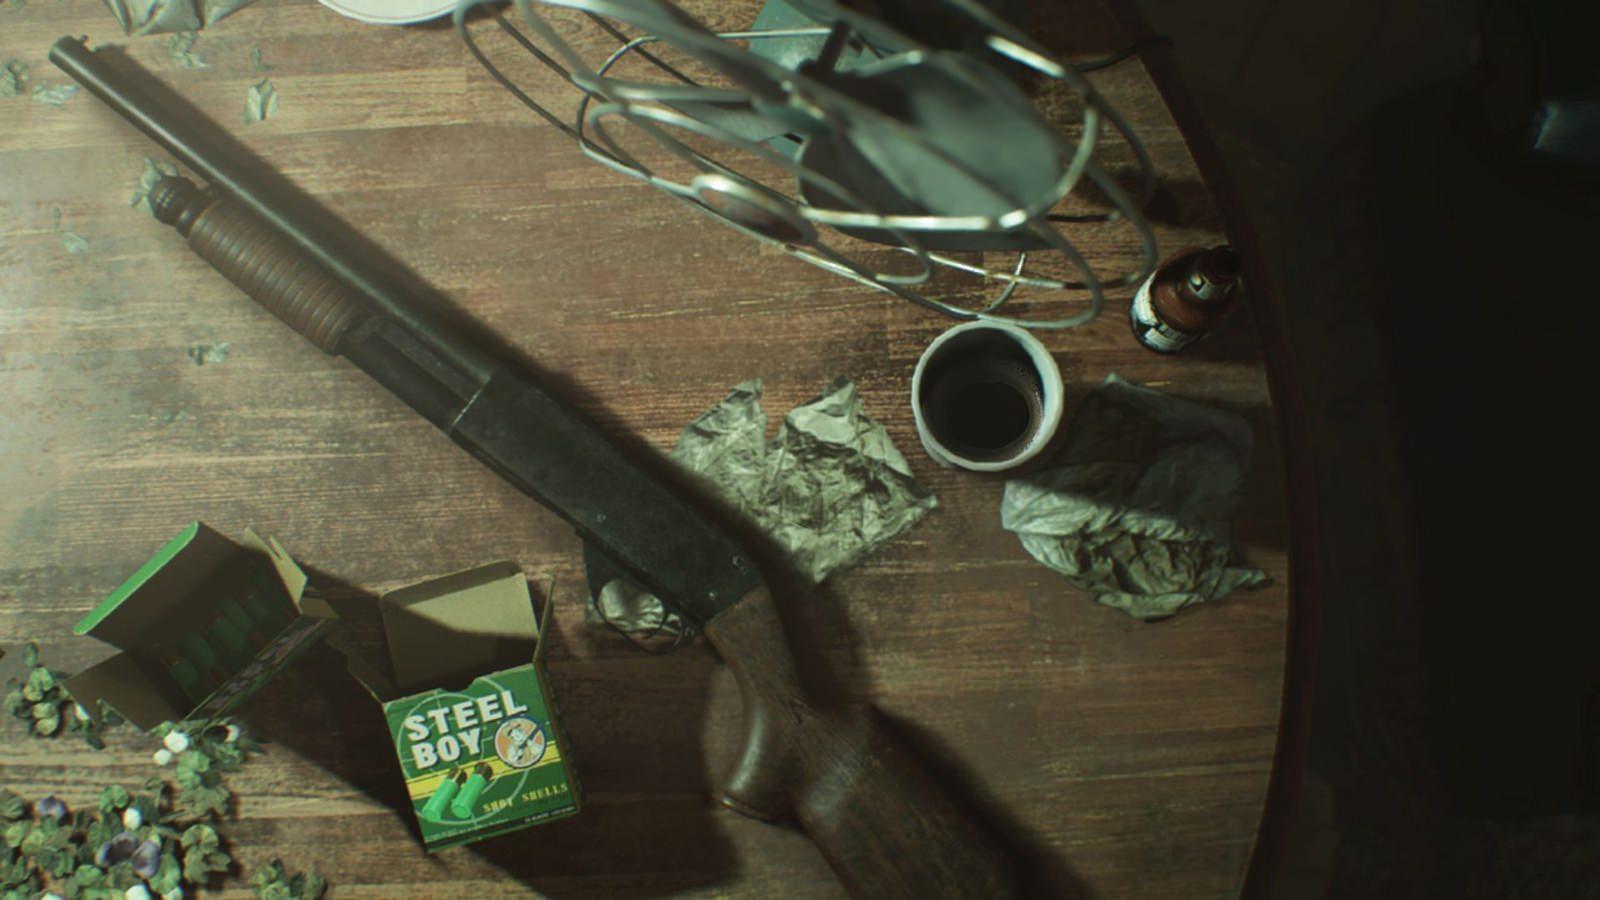 Resident Evil 7 Biohazard shotgun